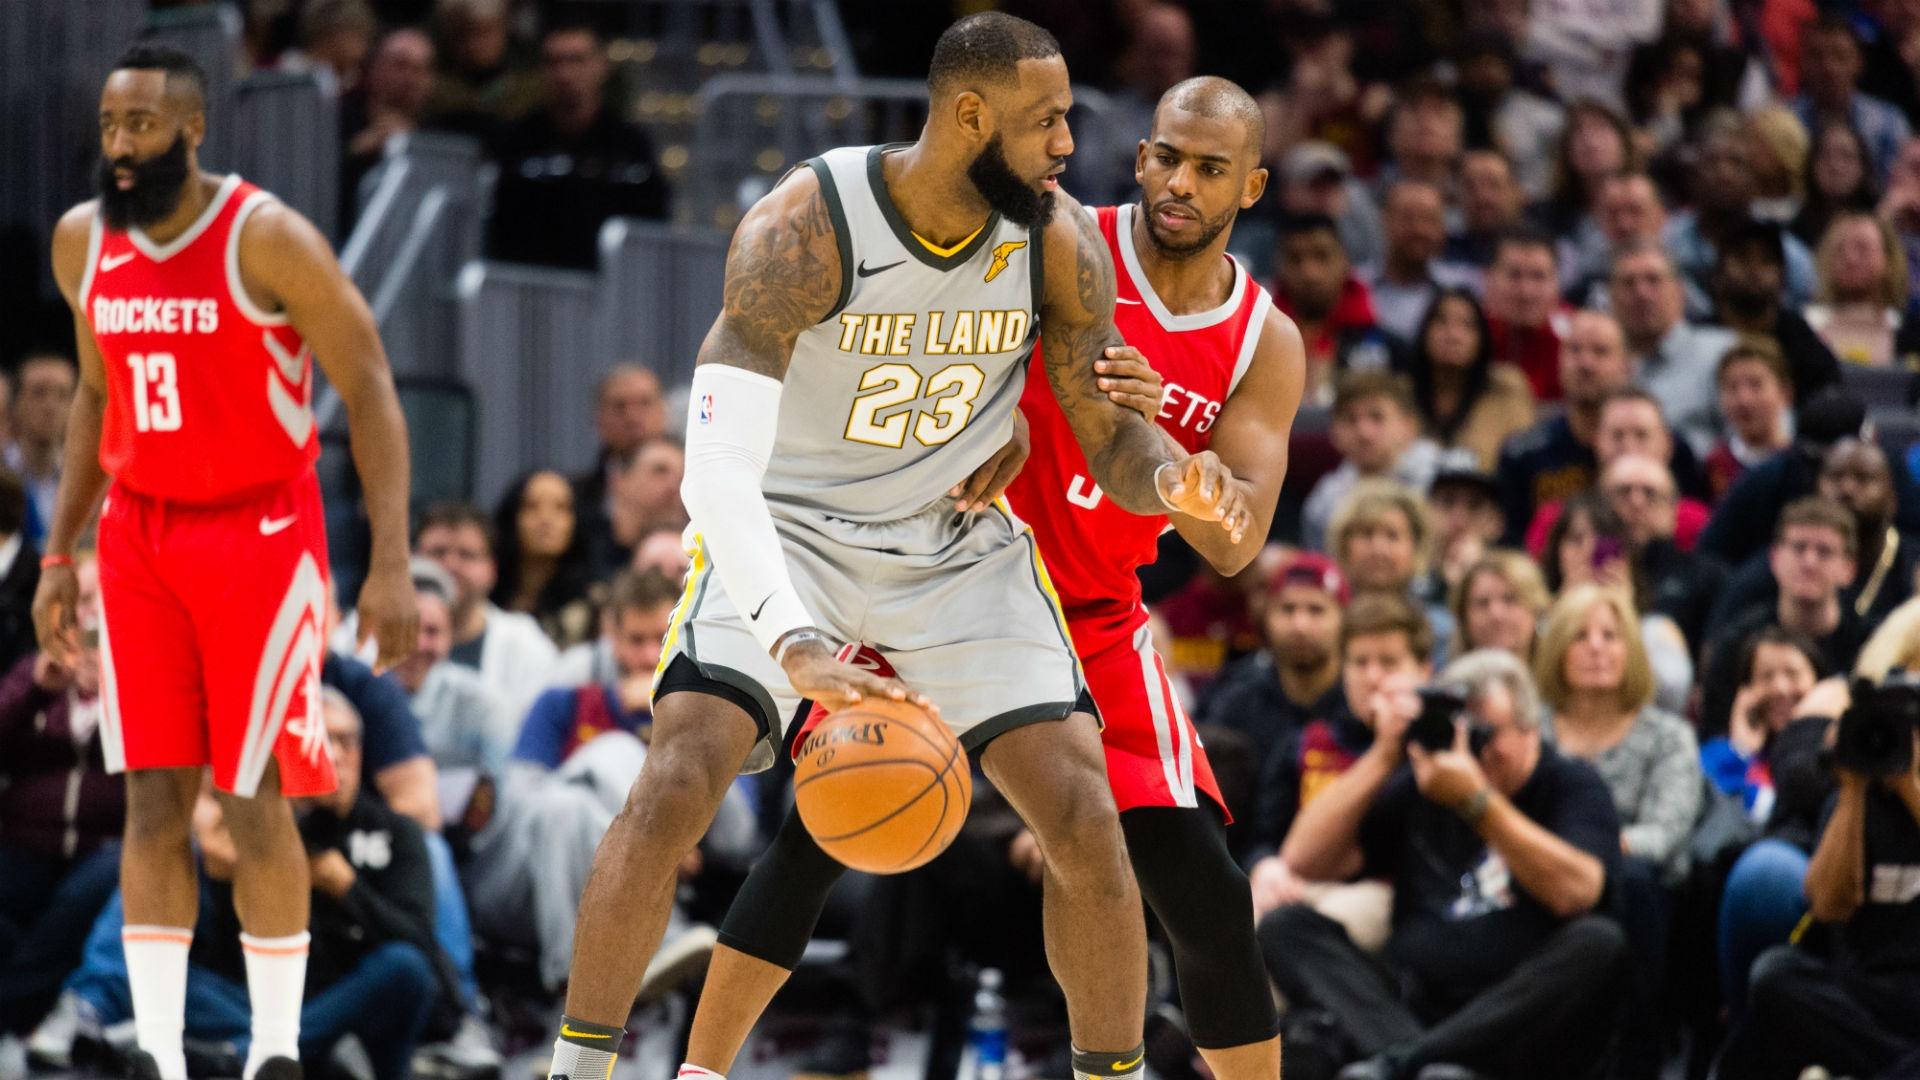 beea5aaeacf Rockets offseason outlook  Will Houston go for big moves or small tweaks in  free agency